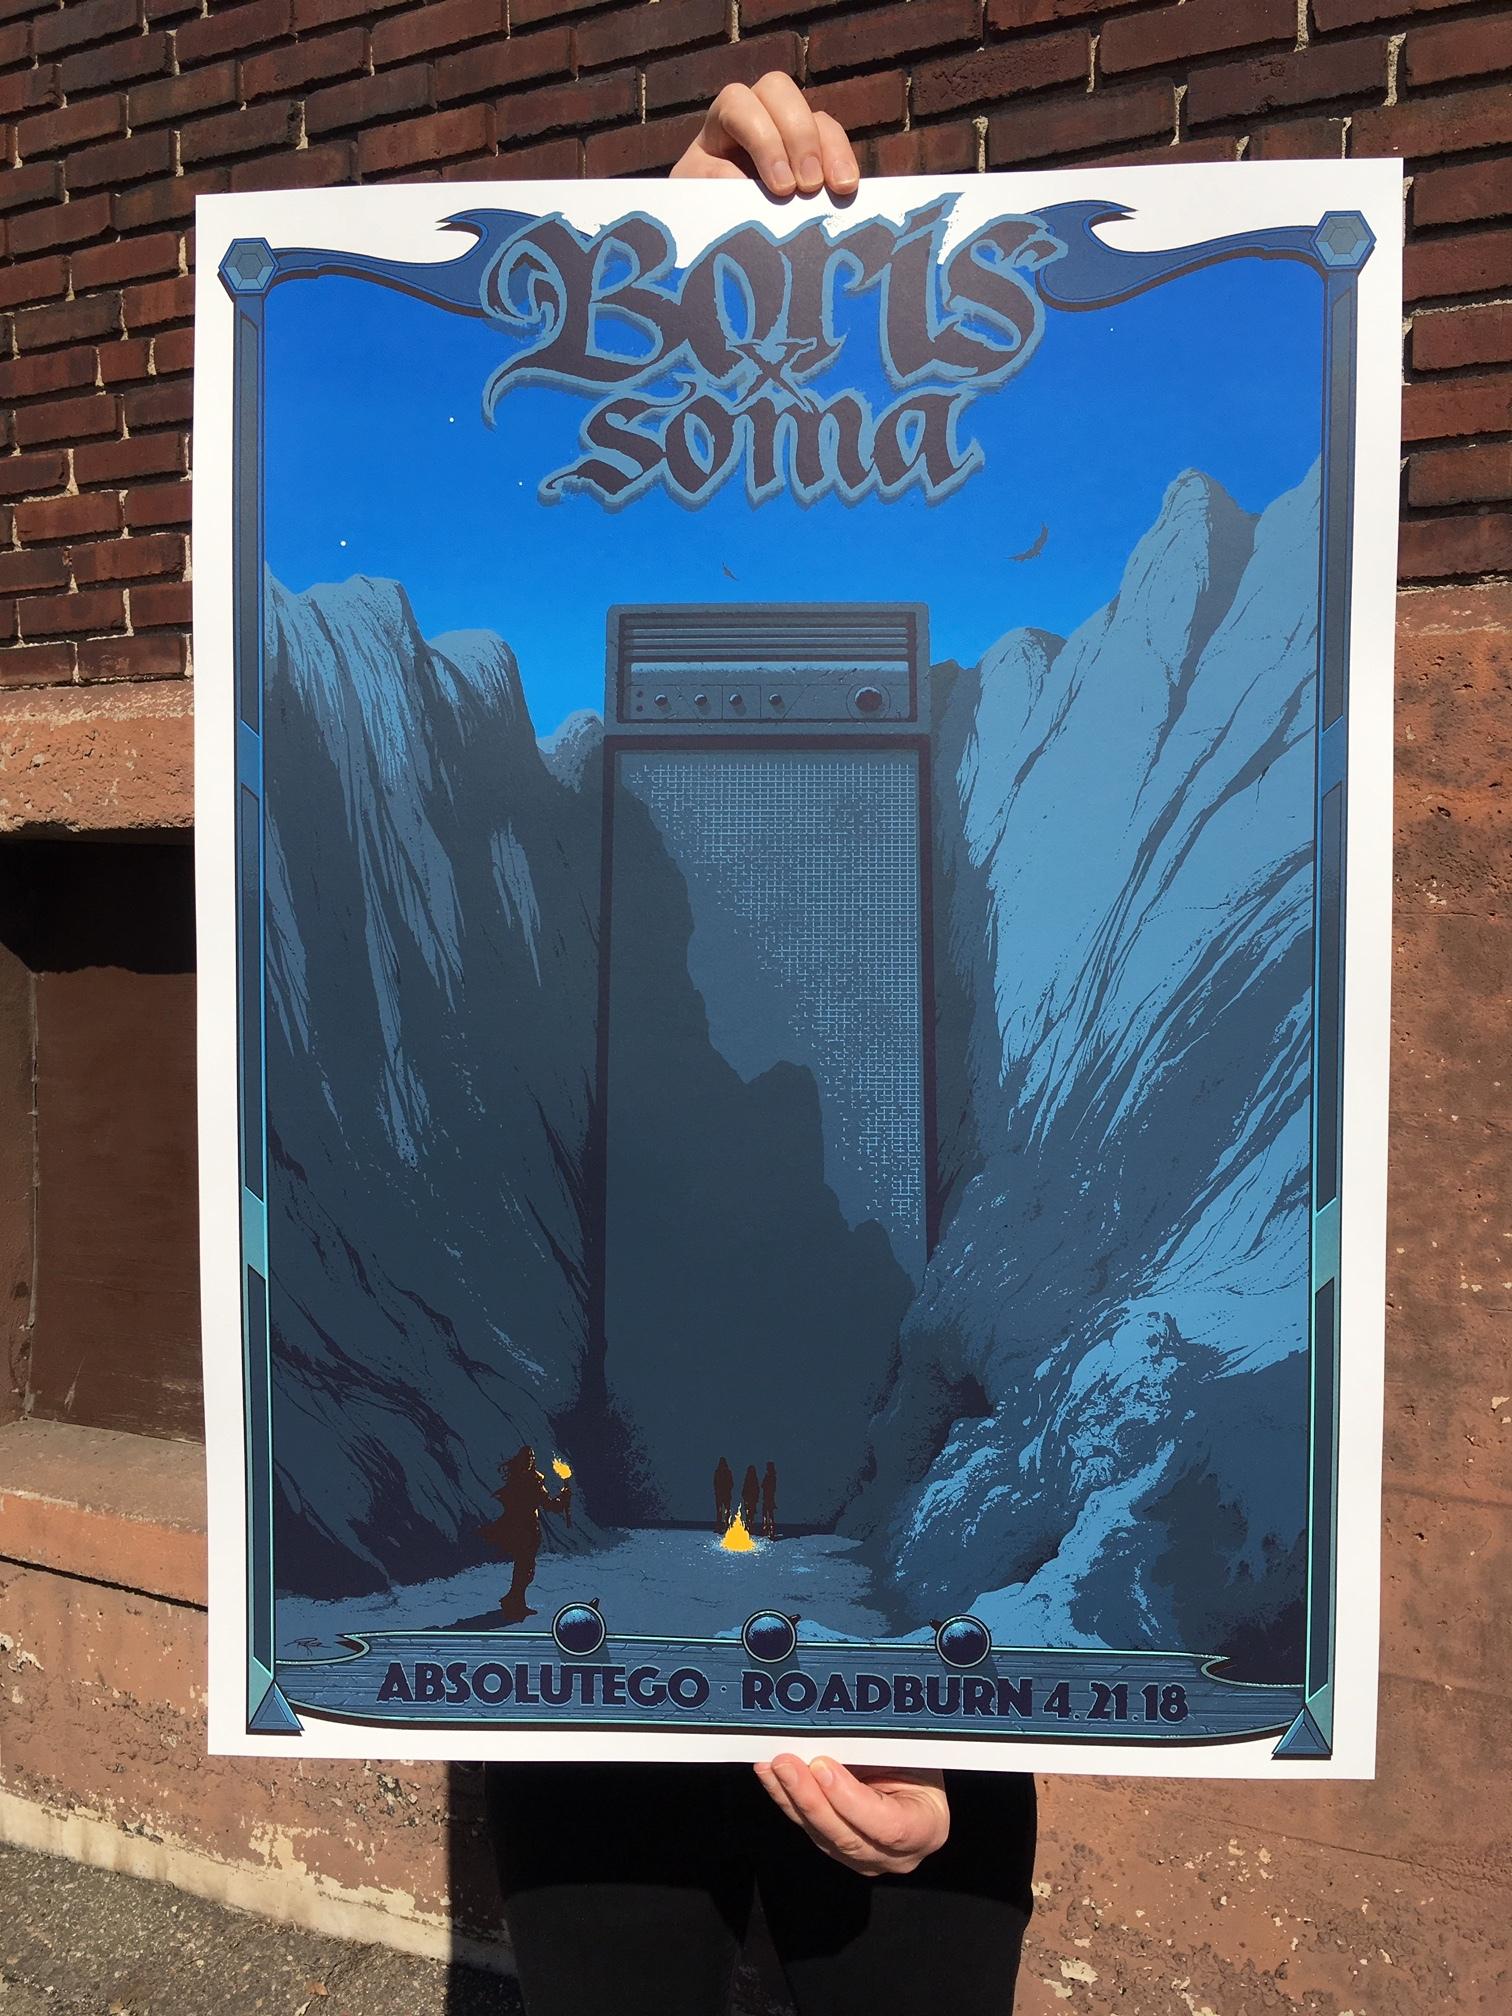 Roper-Boris-poster.JPG